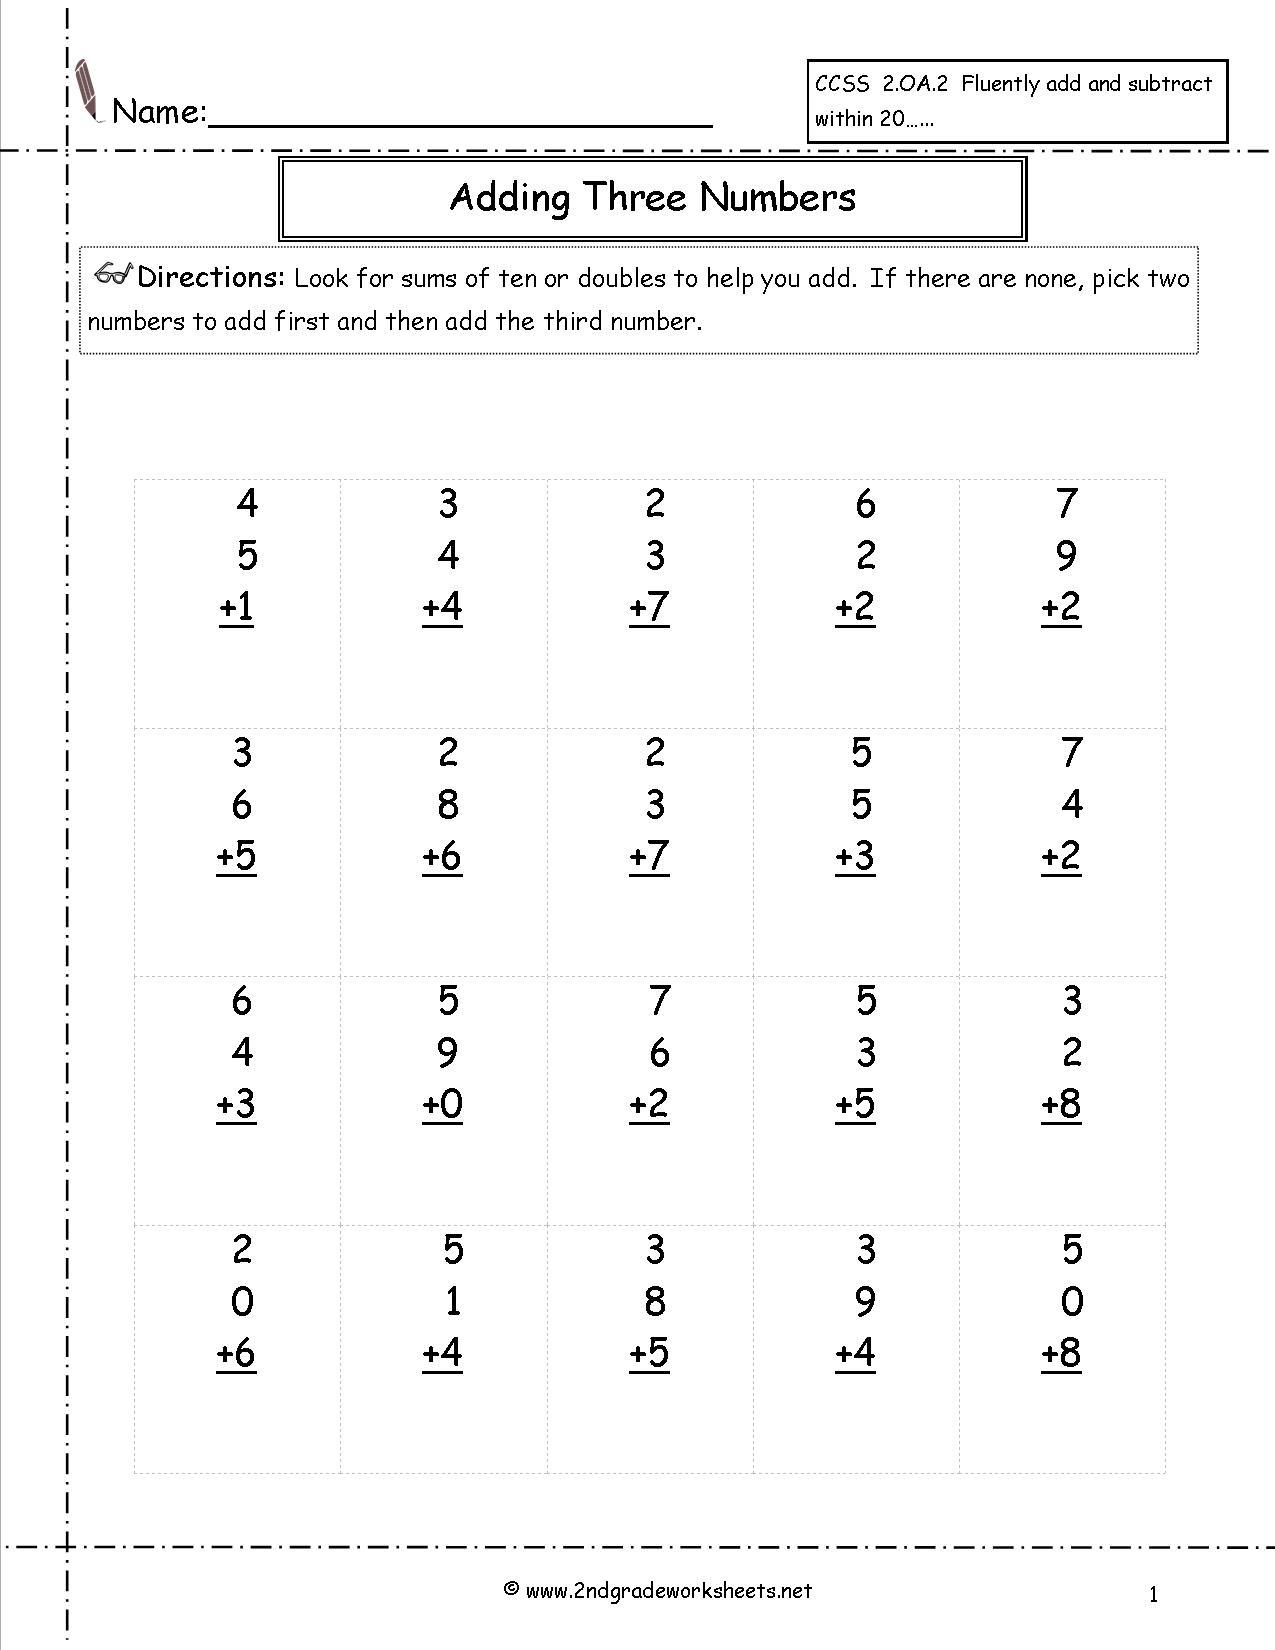 Free Math Worksheets And Printouts | Printable 2Nd Grade Math Worksheets